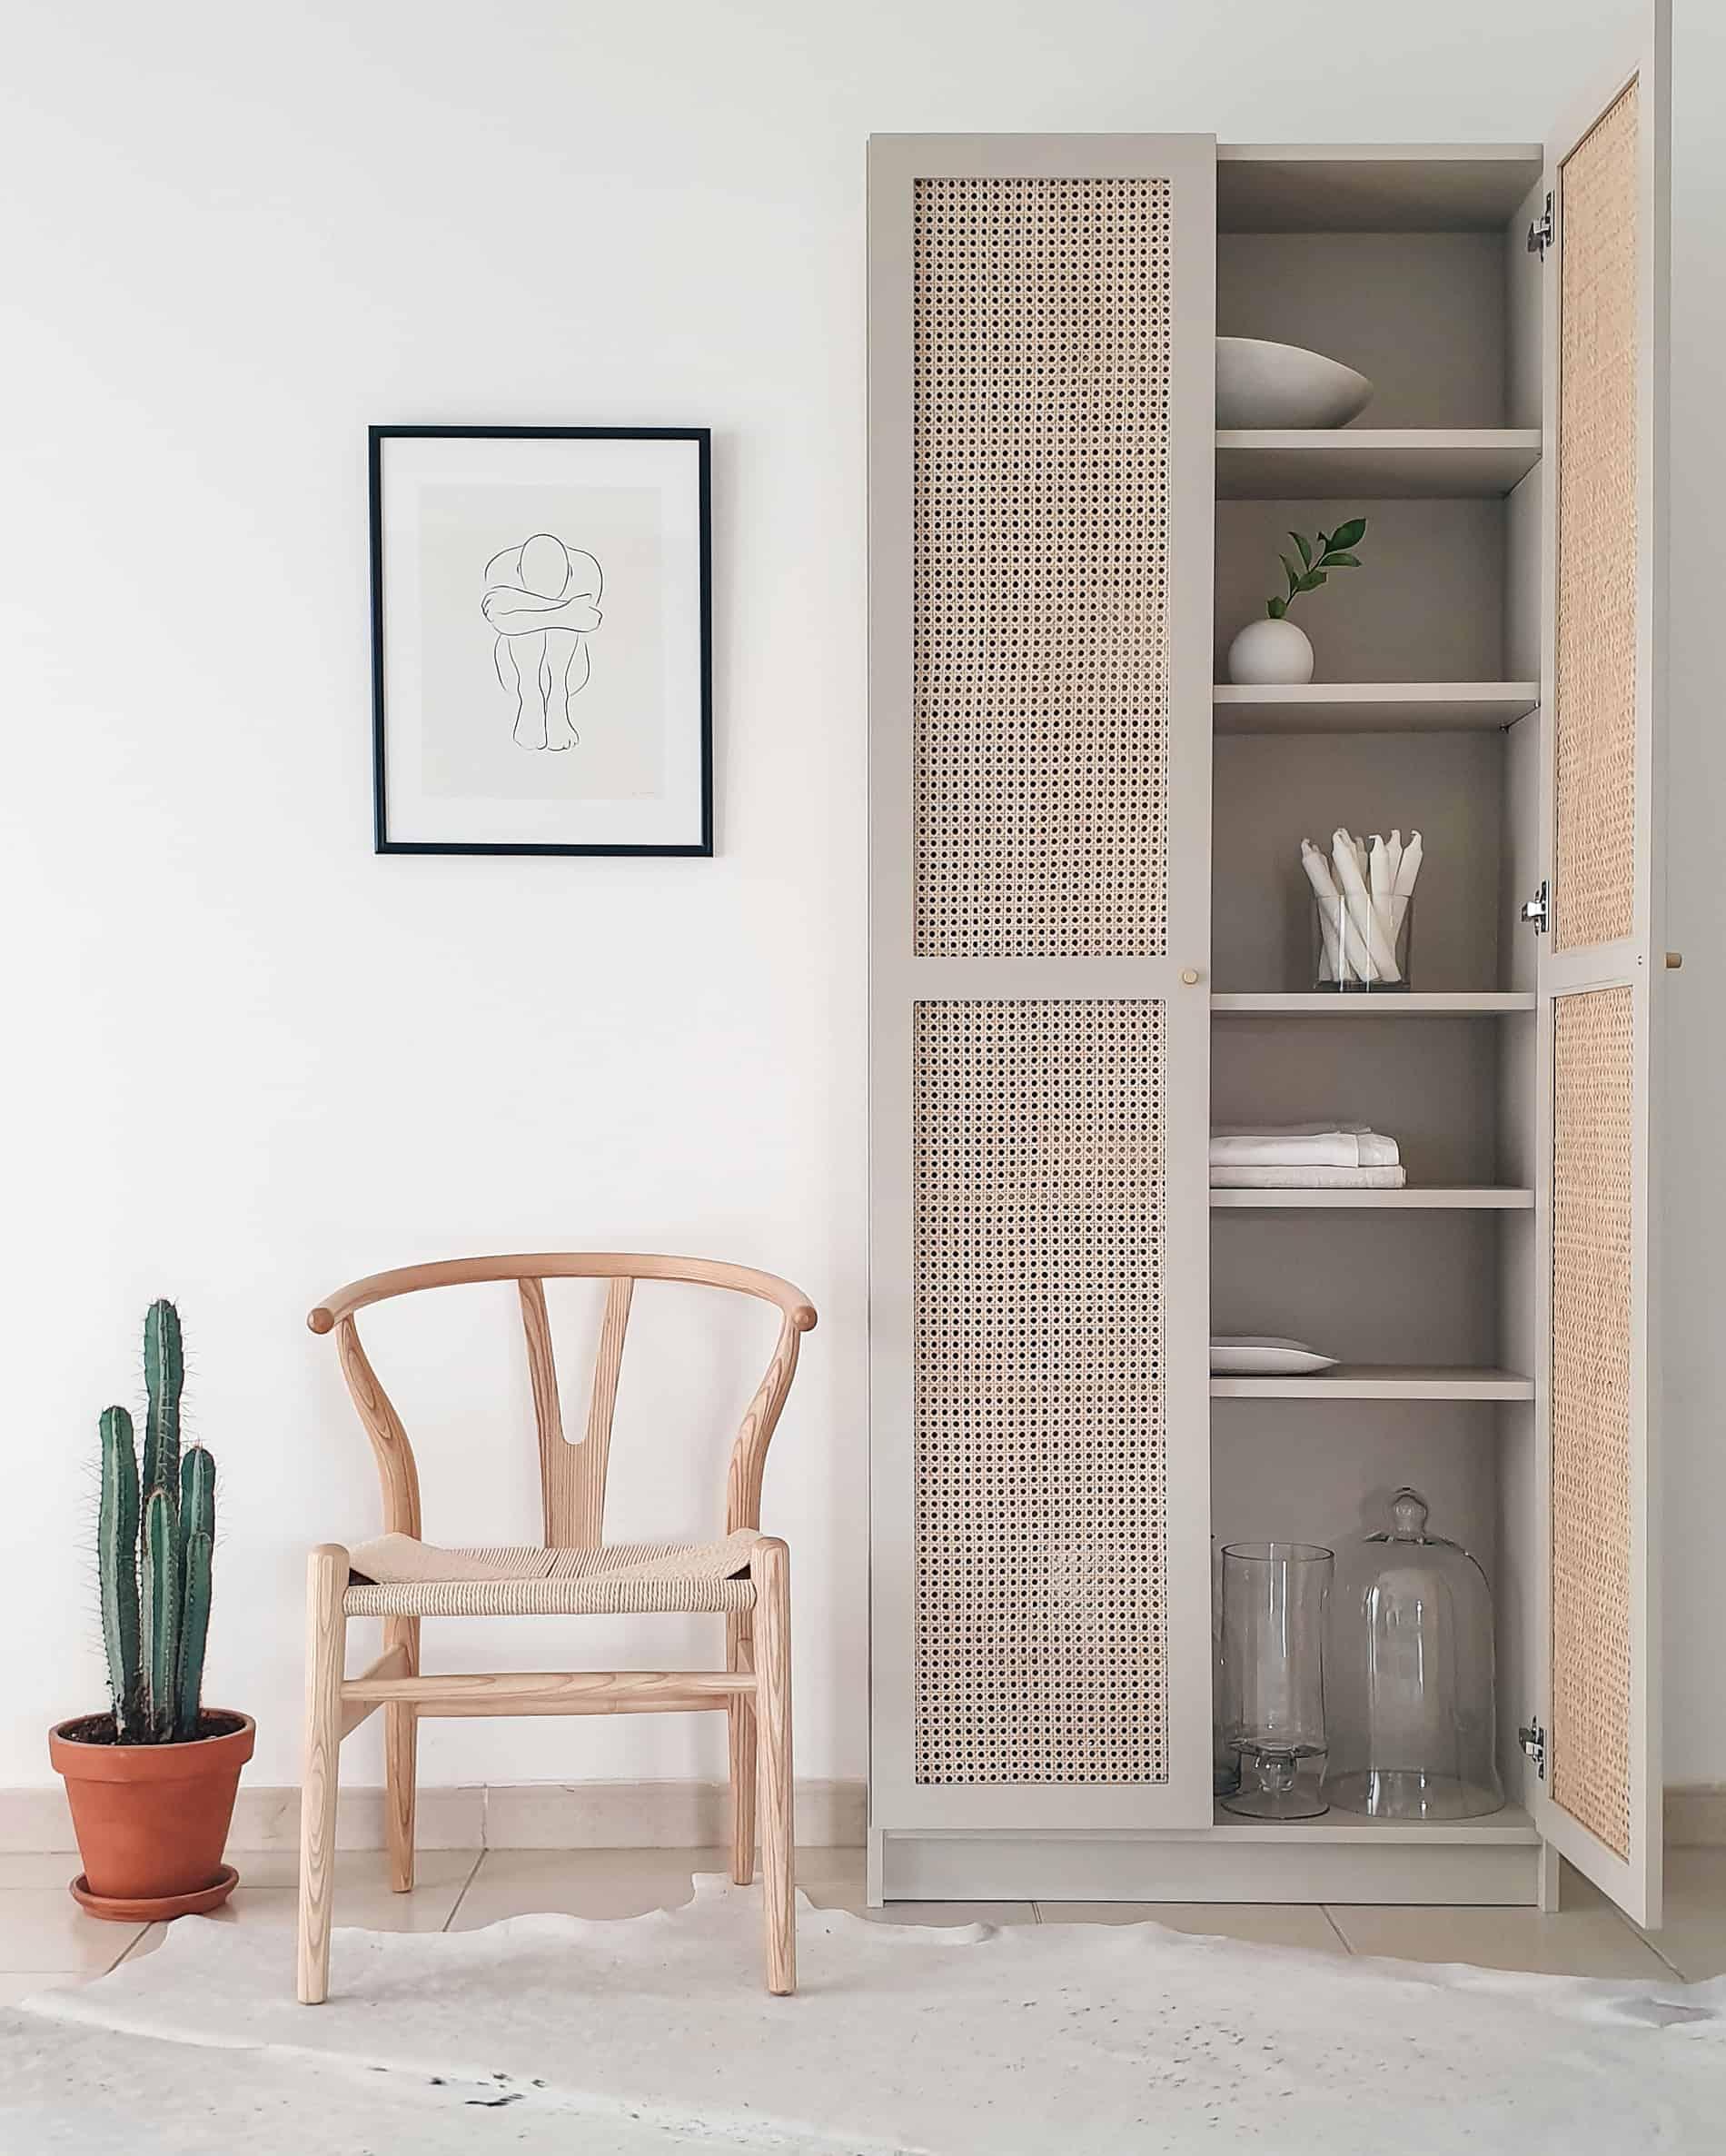 Ikea Hack 5 Idees Pour Customiser Vos Meubles Ikea Lili In Wonderland